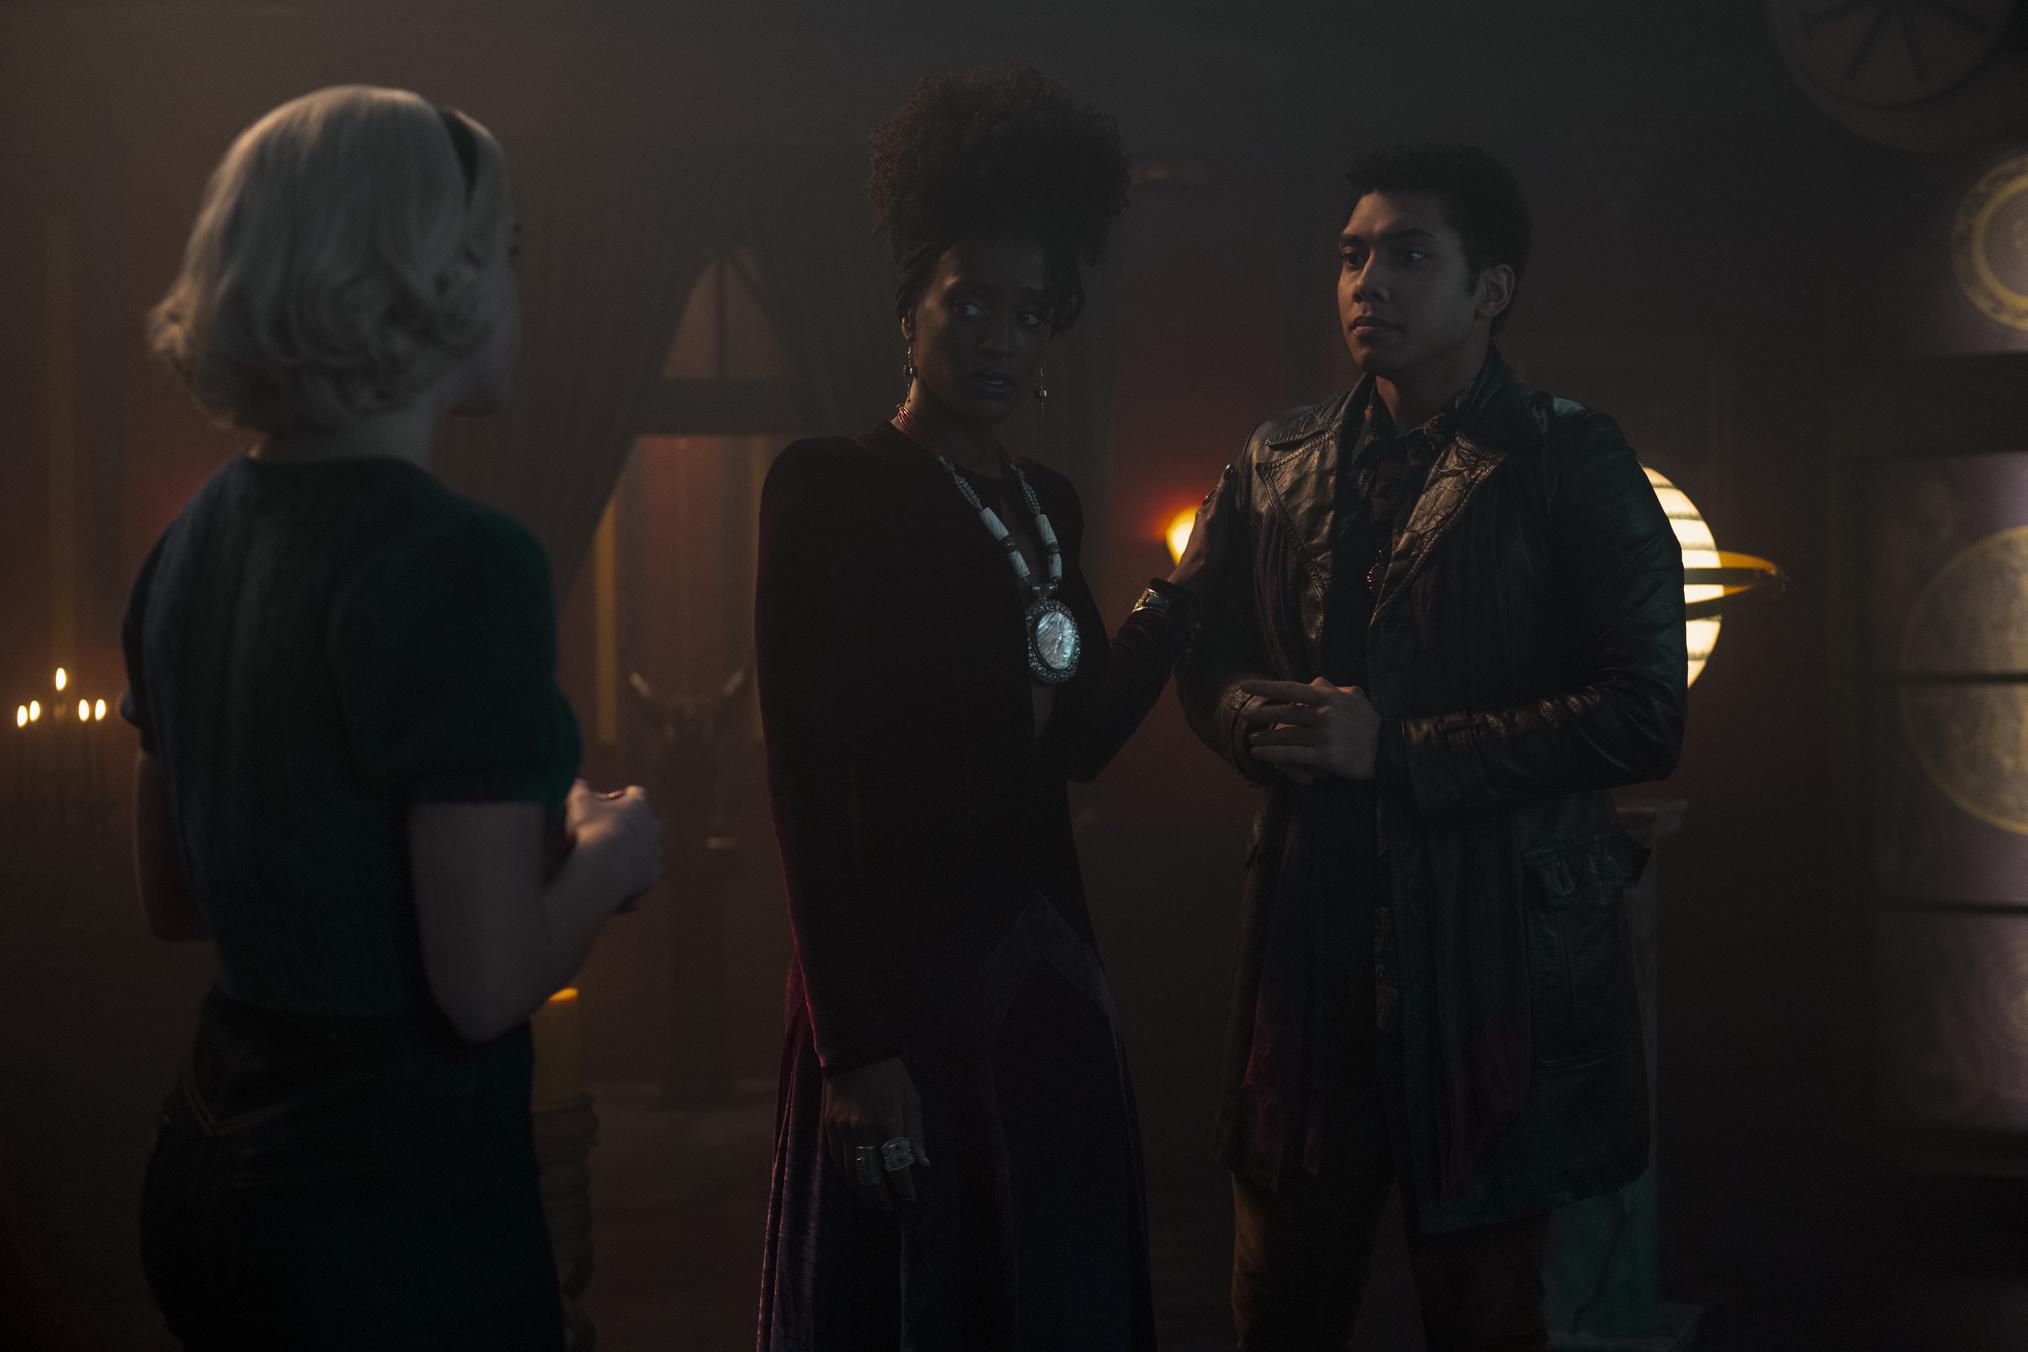 Kiernan Shipka, Chance Perdomo, Skye P Marshall dans Chilling Adventures of Sabrina Chapitre 33